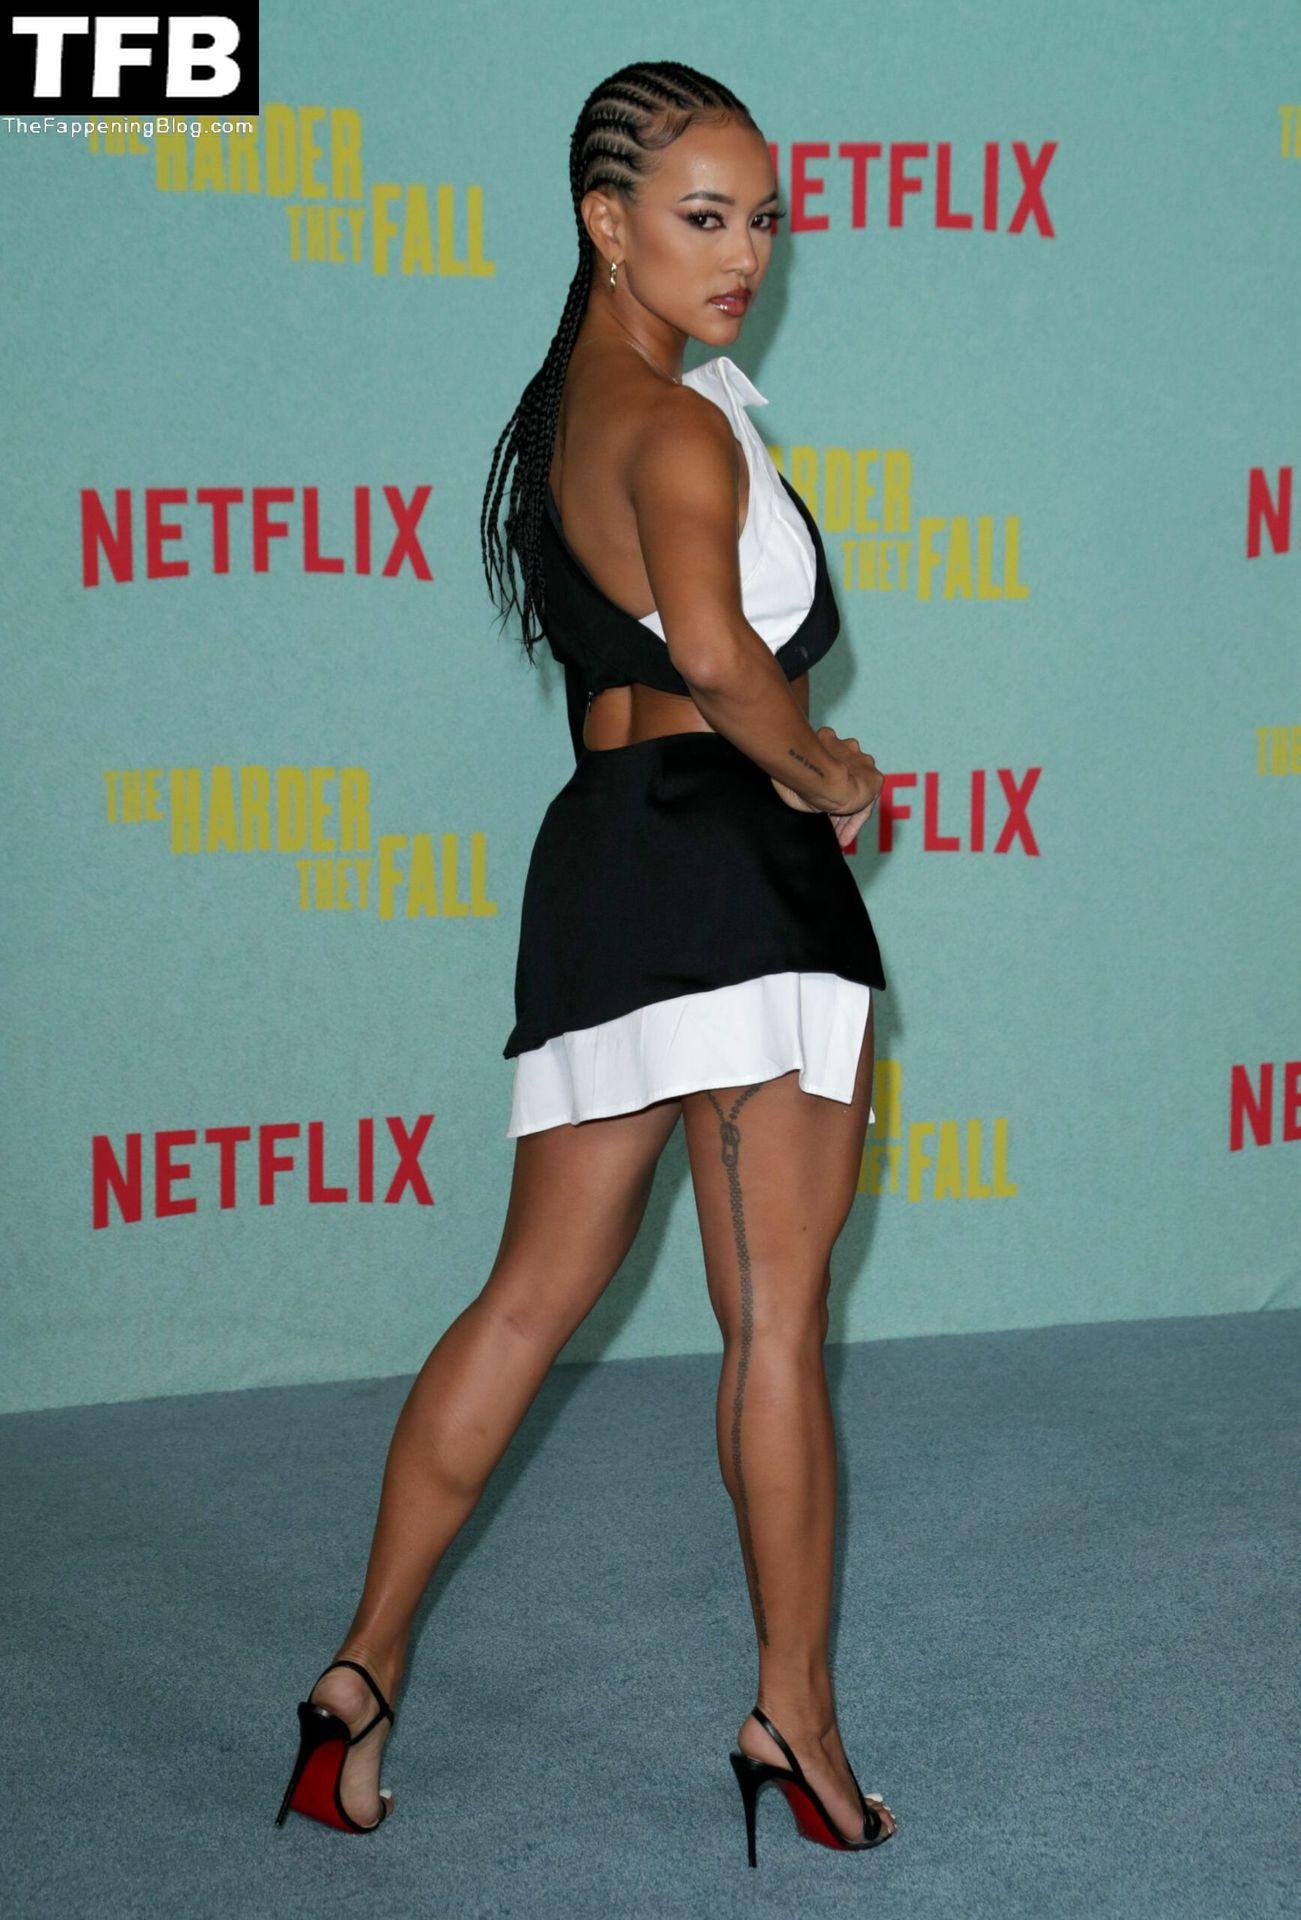 Karrueche-Tran-Sexy-Legs-Upskirt-The-Fappening-Blog-8.jpg